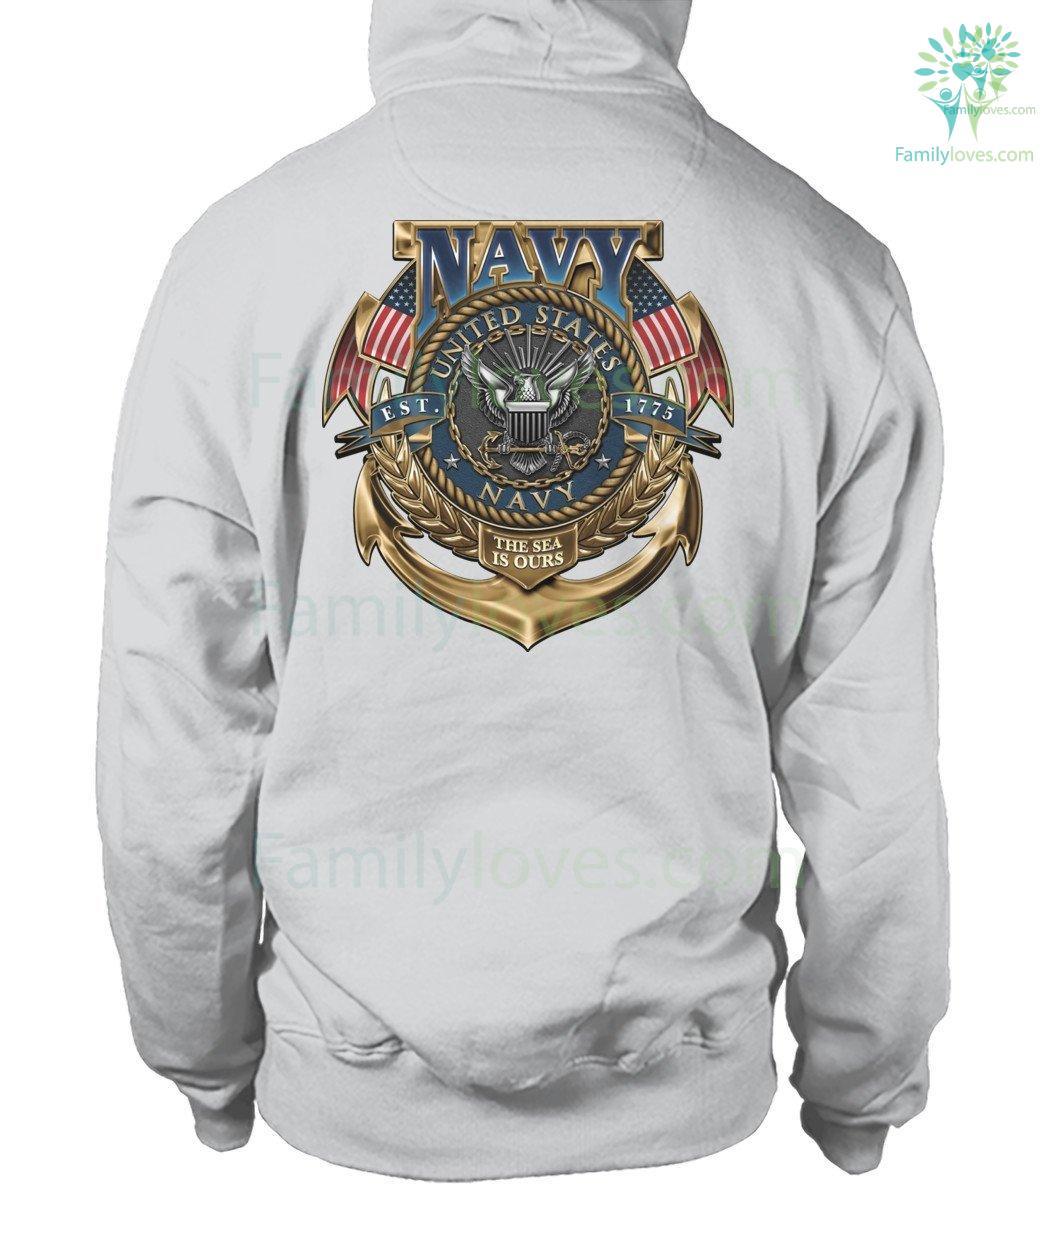 United States Navy-Anytime Anywhere Hooded Sweatshirt